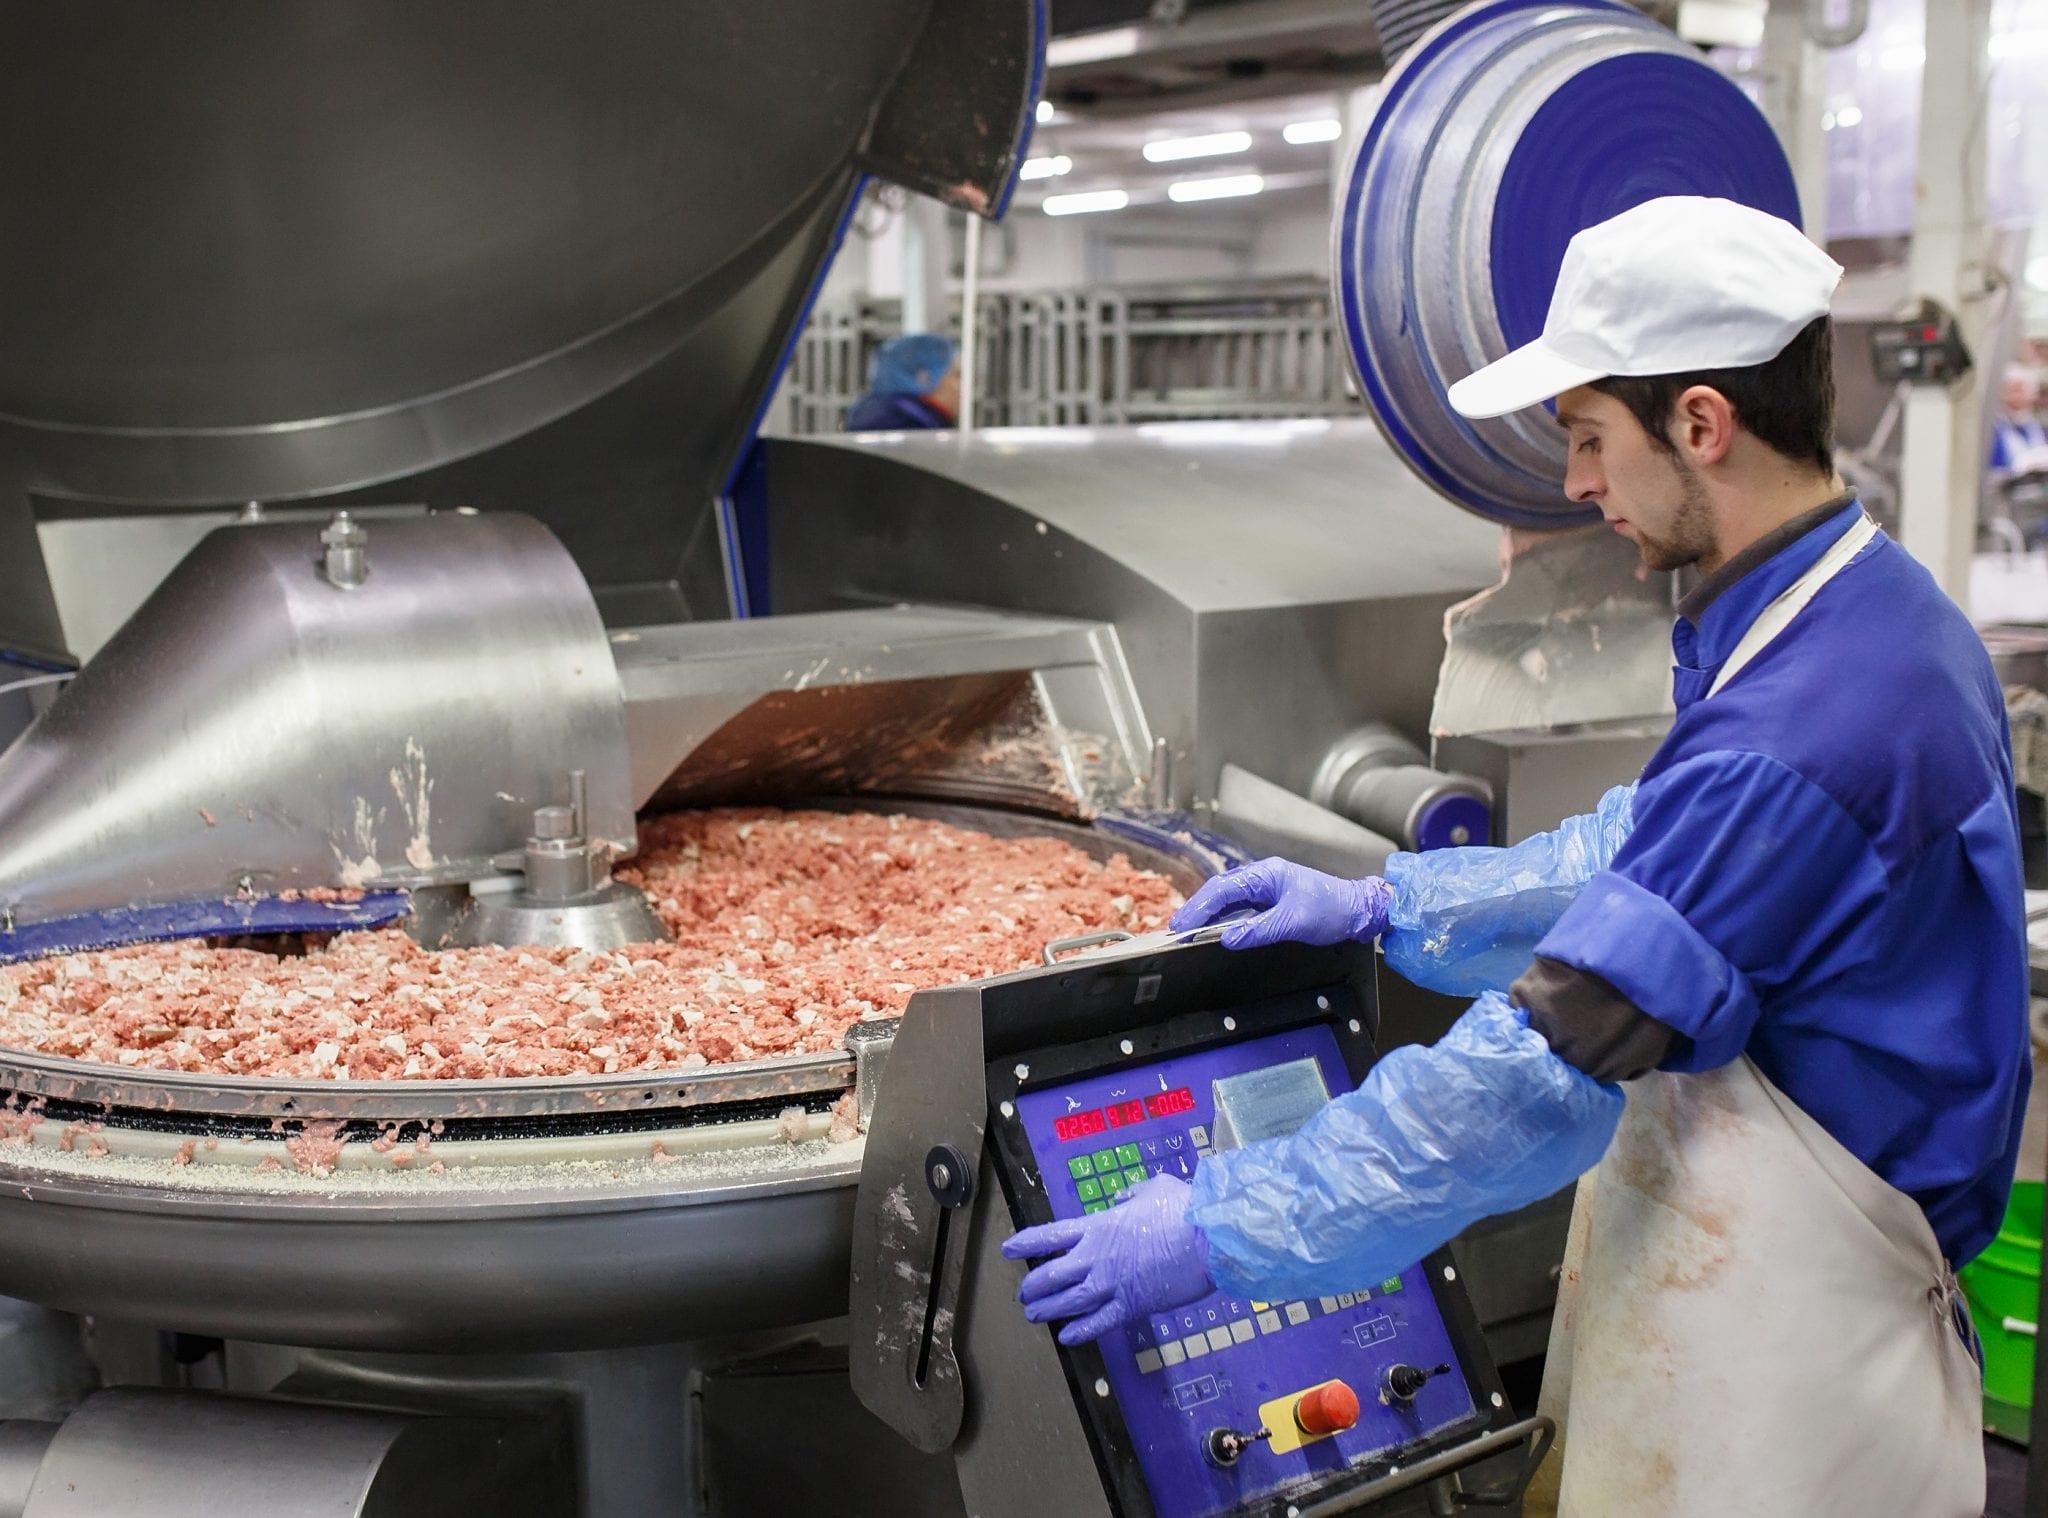 Meat industry photo worker standing over grinder